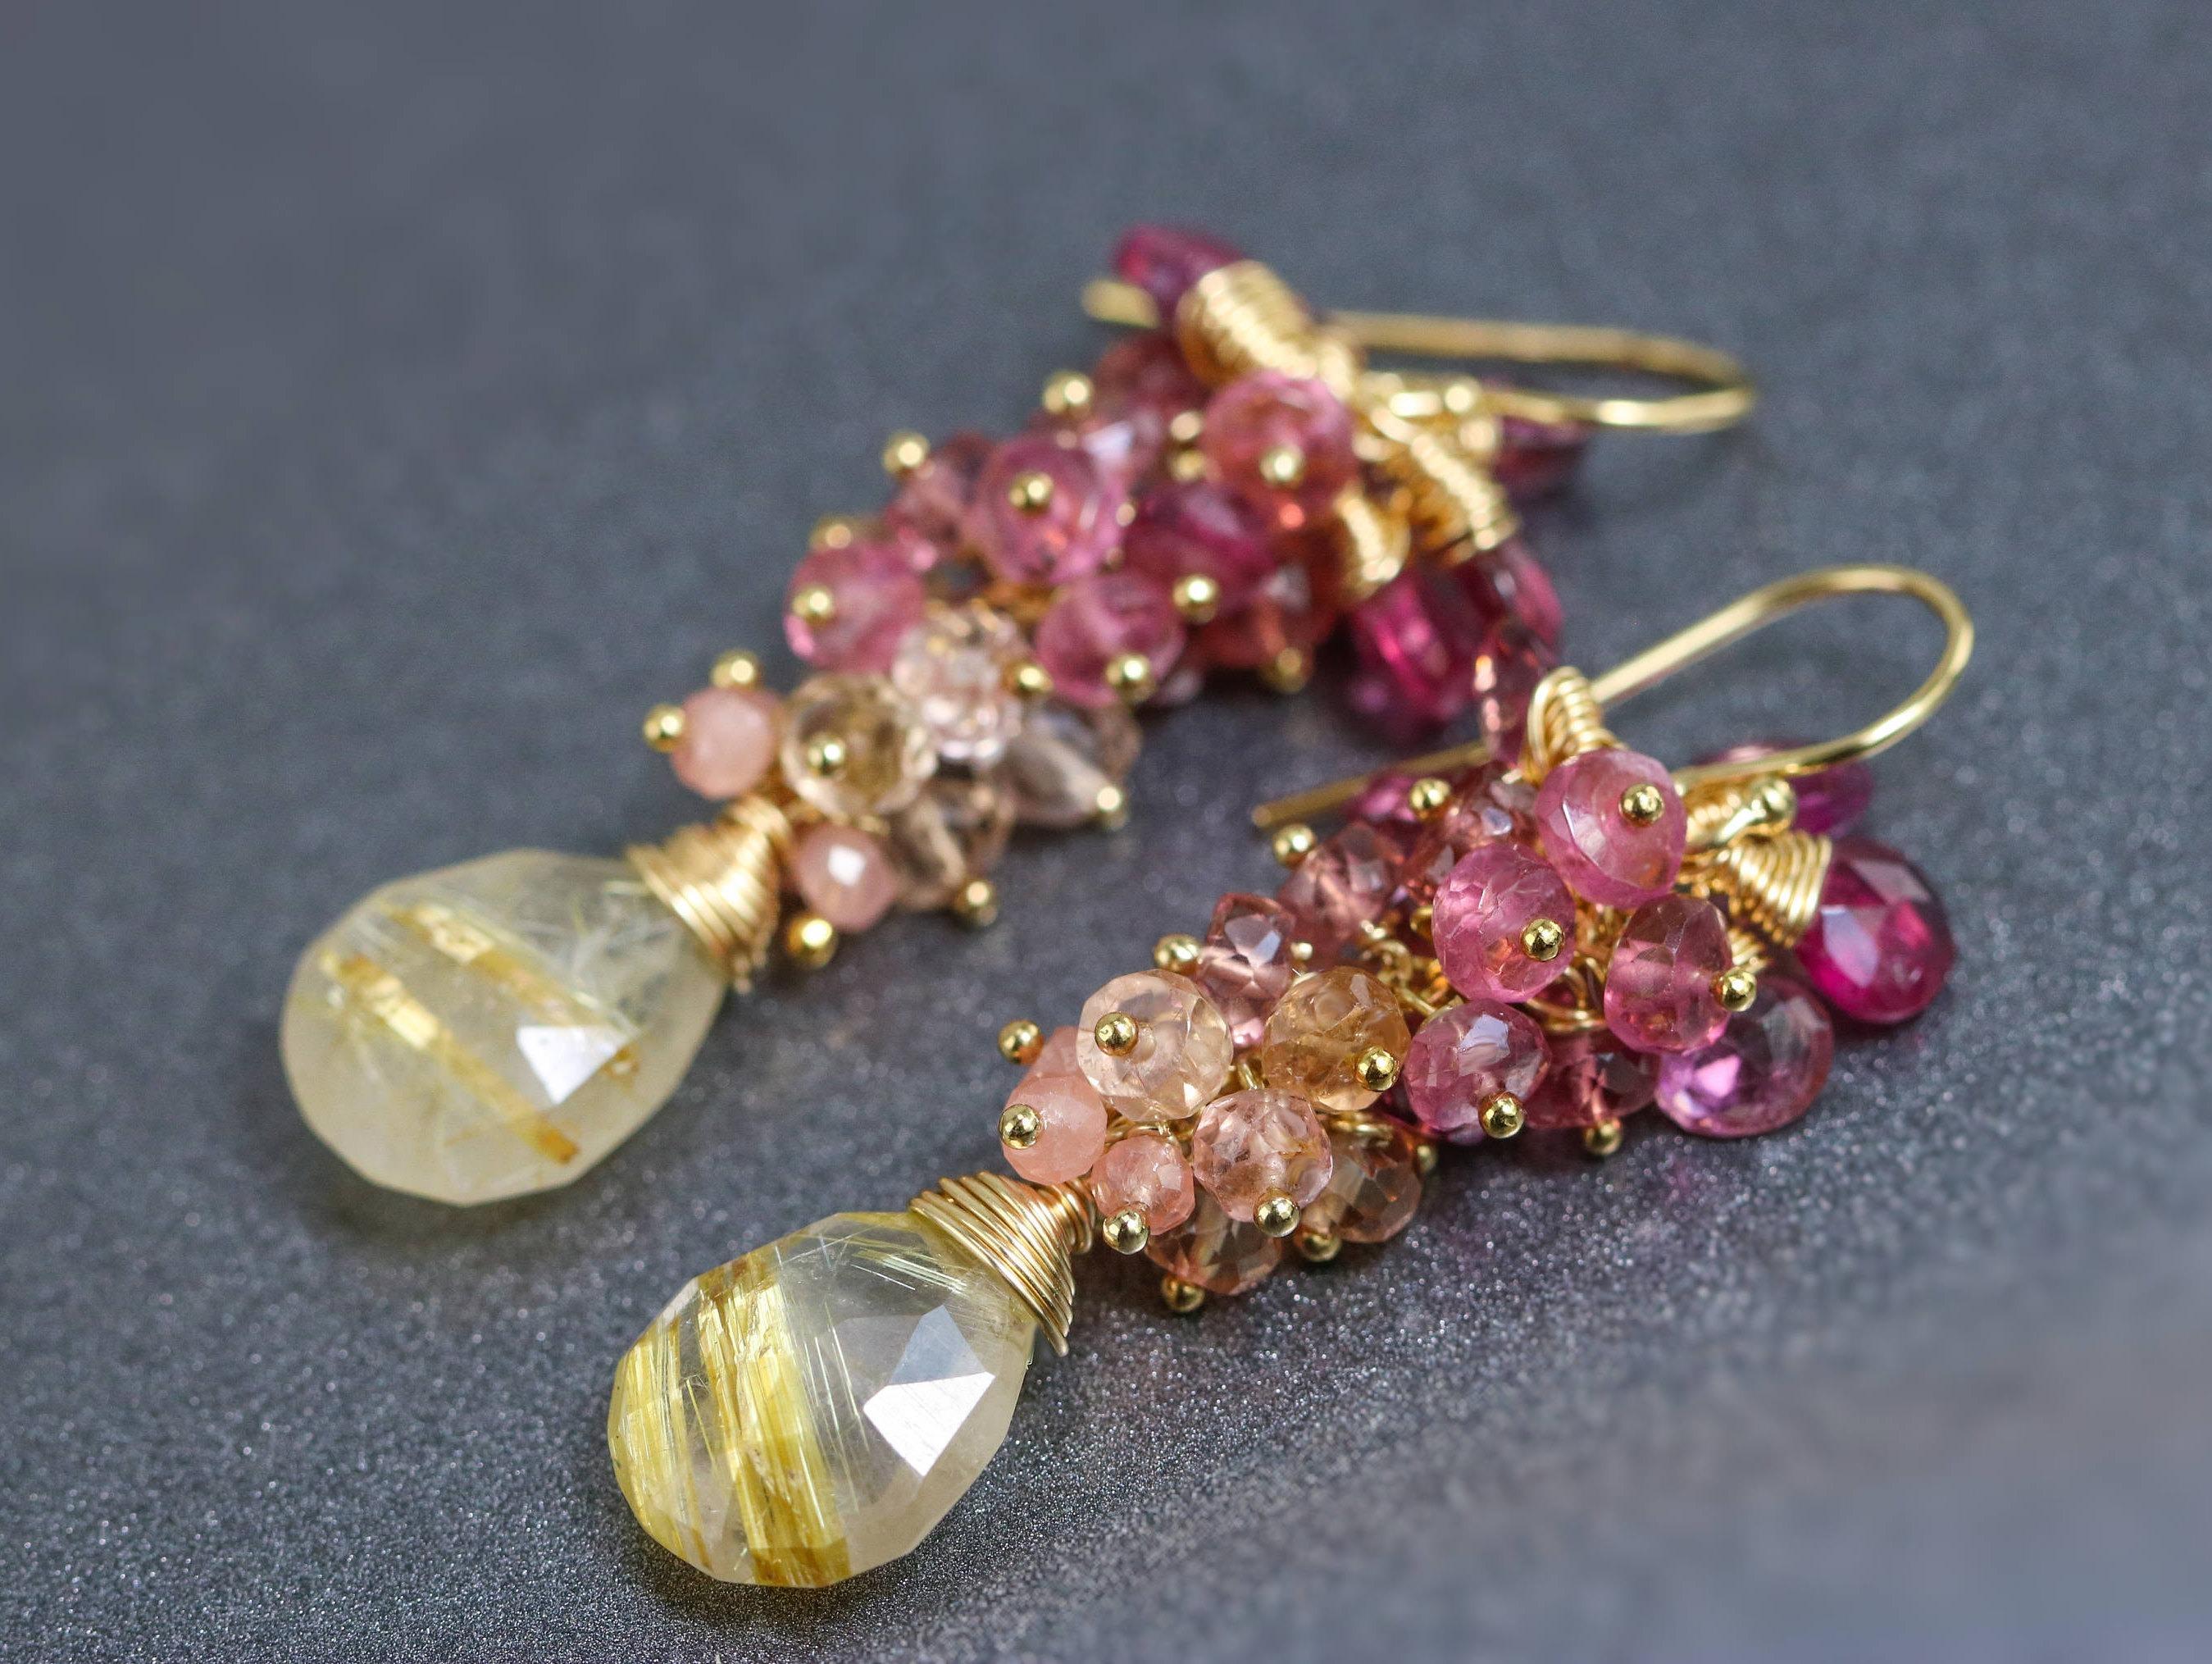 Pink tourmaline and golden rutilated quartz gold filled for Golden rutilated quartz jewelry